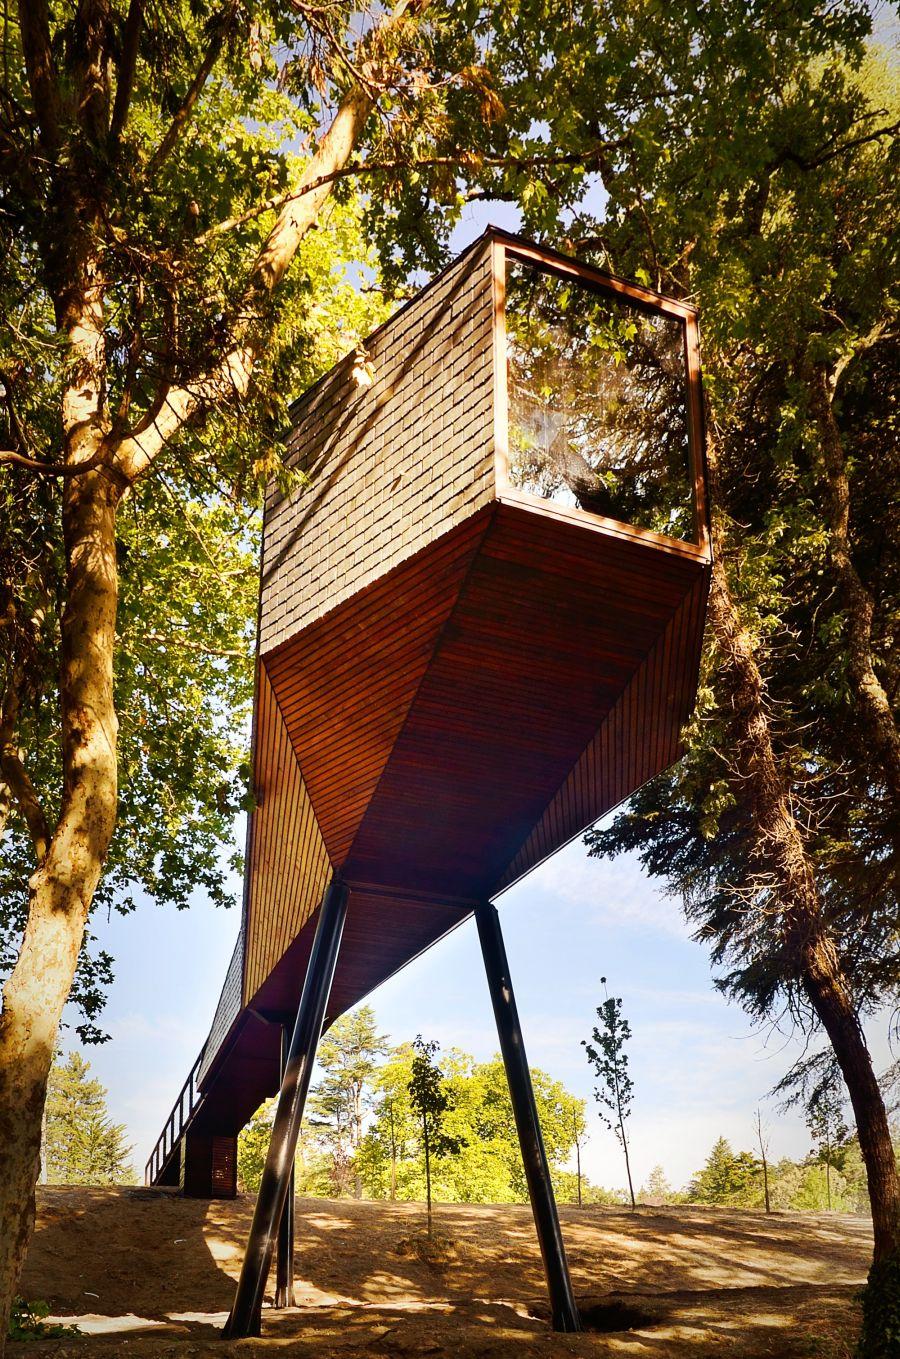 Tress Snake House in Pedras Salgadas Eco Resort, Portugal